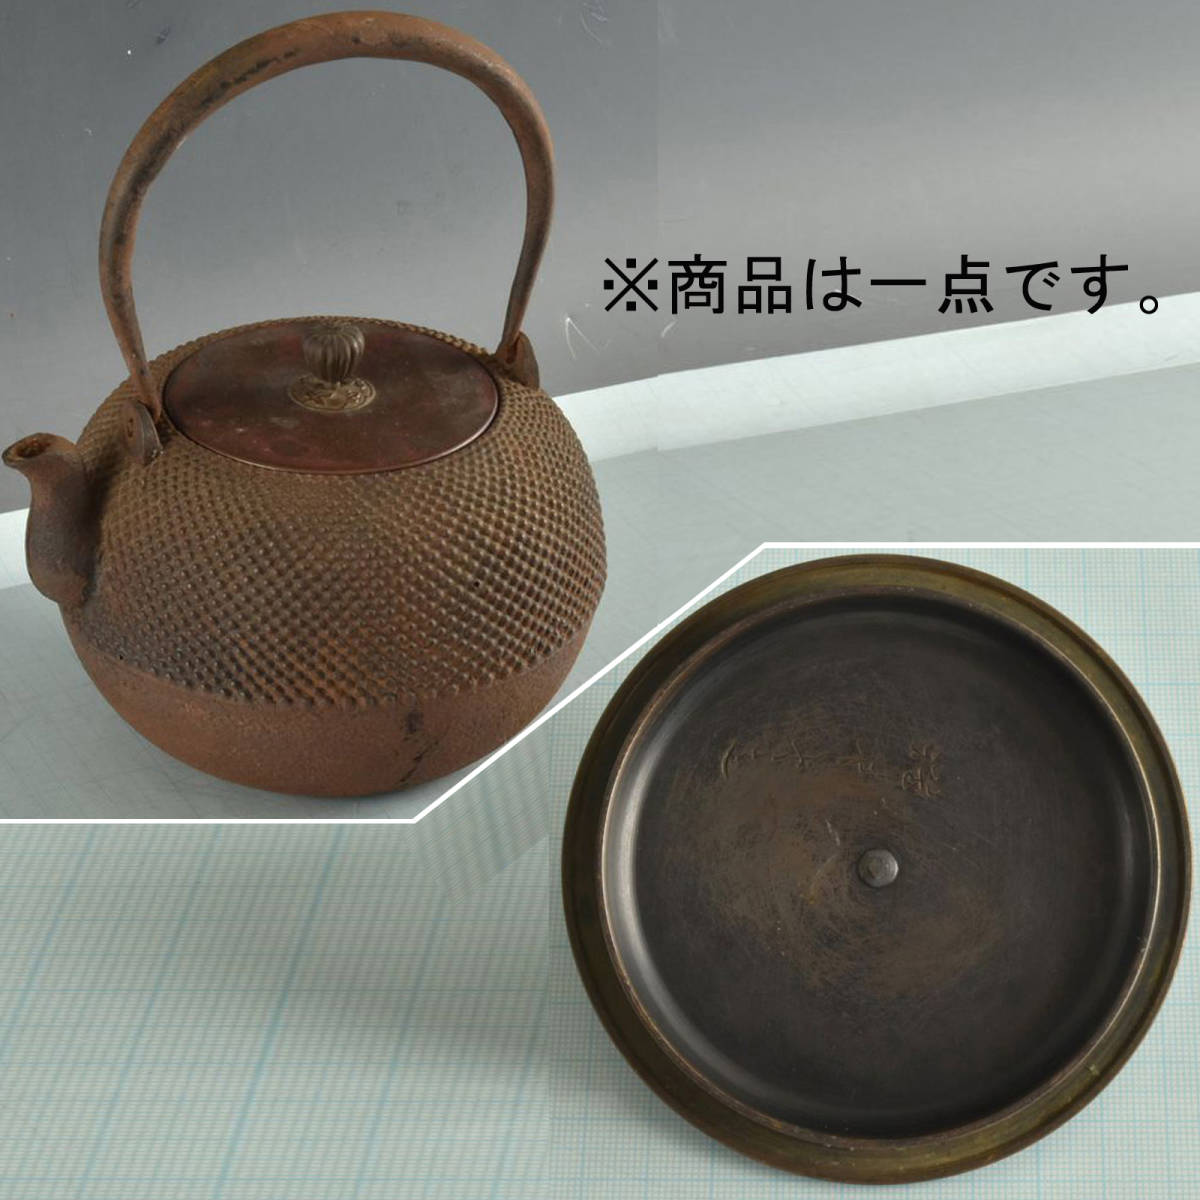 C09303 祥雲堂 あられ鉄瓶 蓋226g 本体1644g:真作